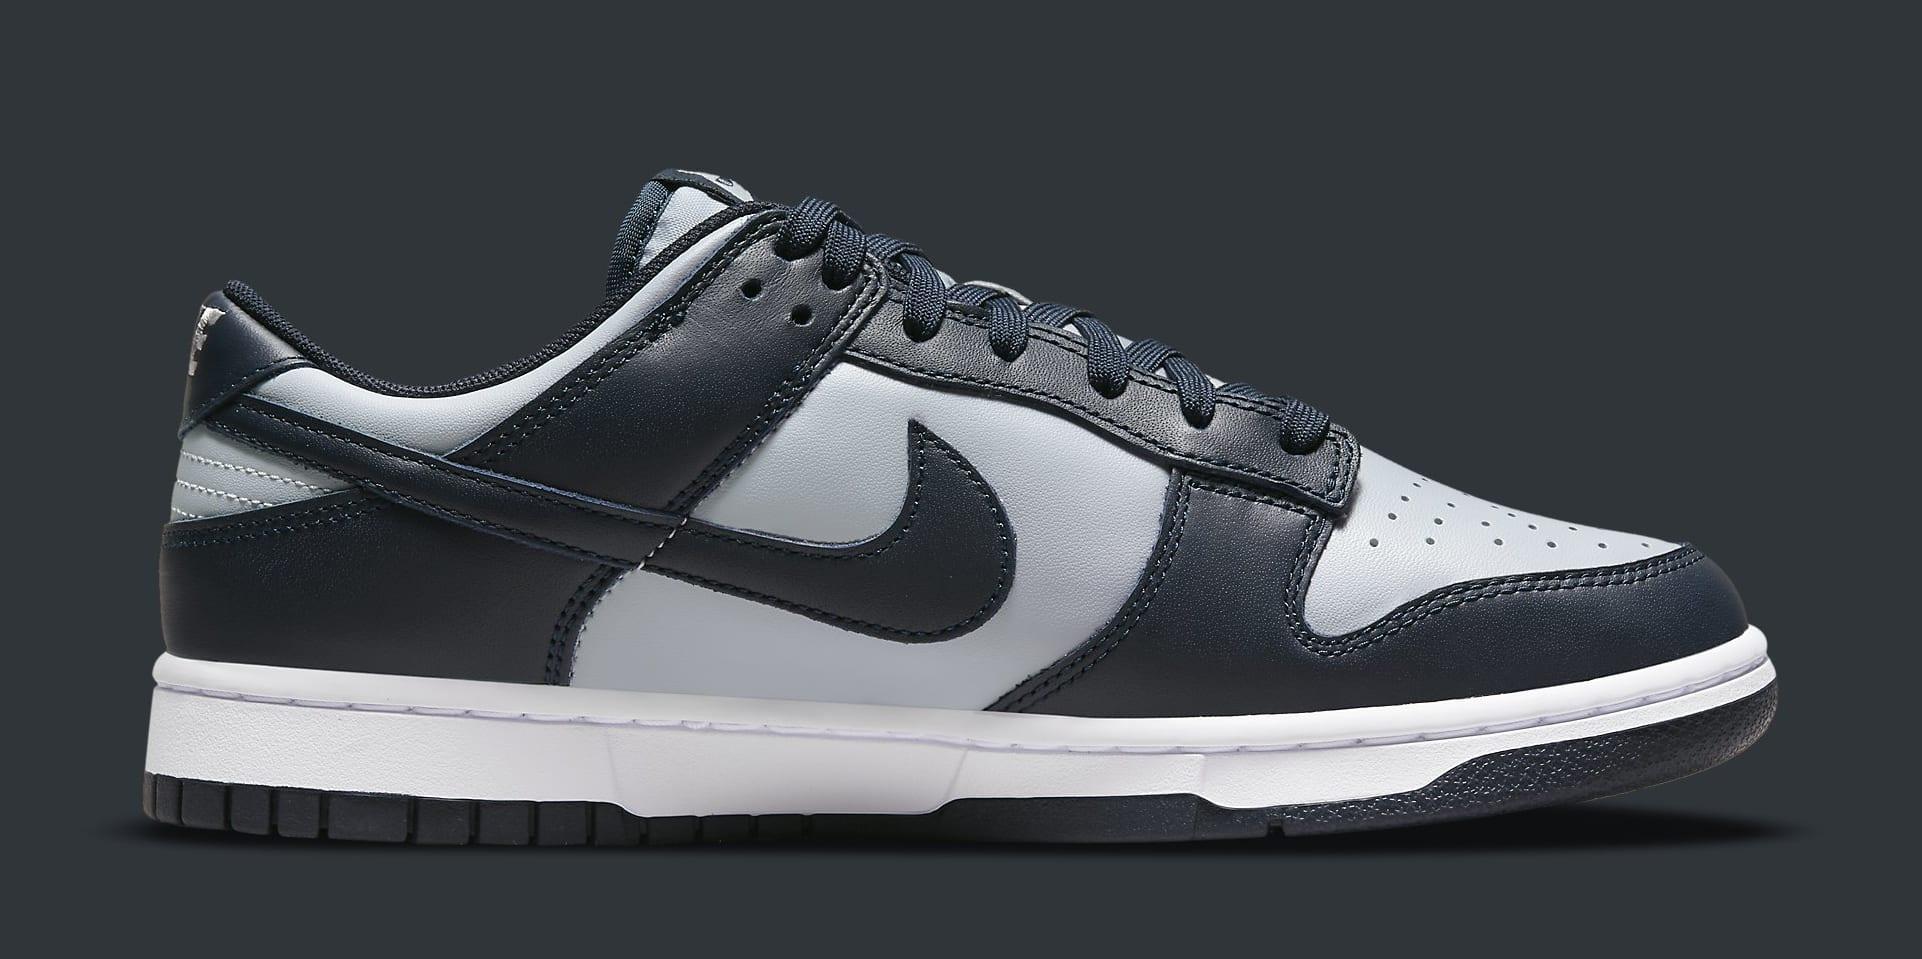 Nike Dunk Low 'Georgetown' DD1391-003 Medial